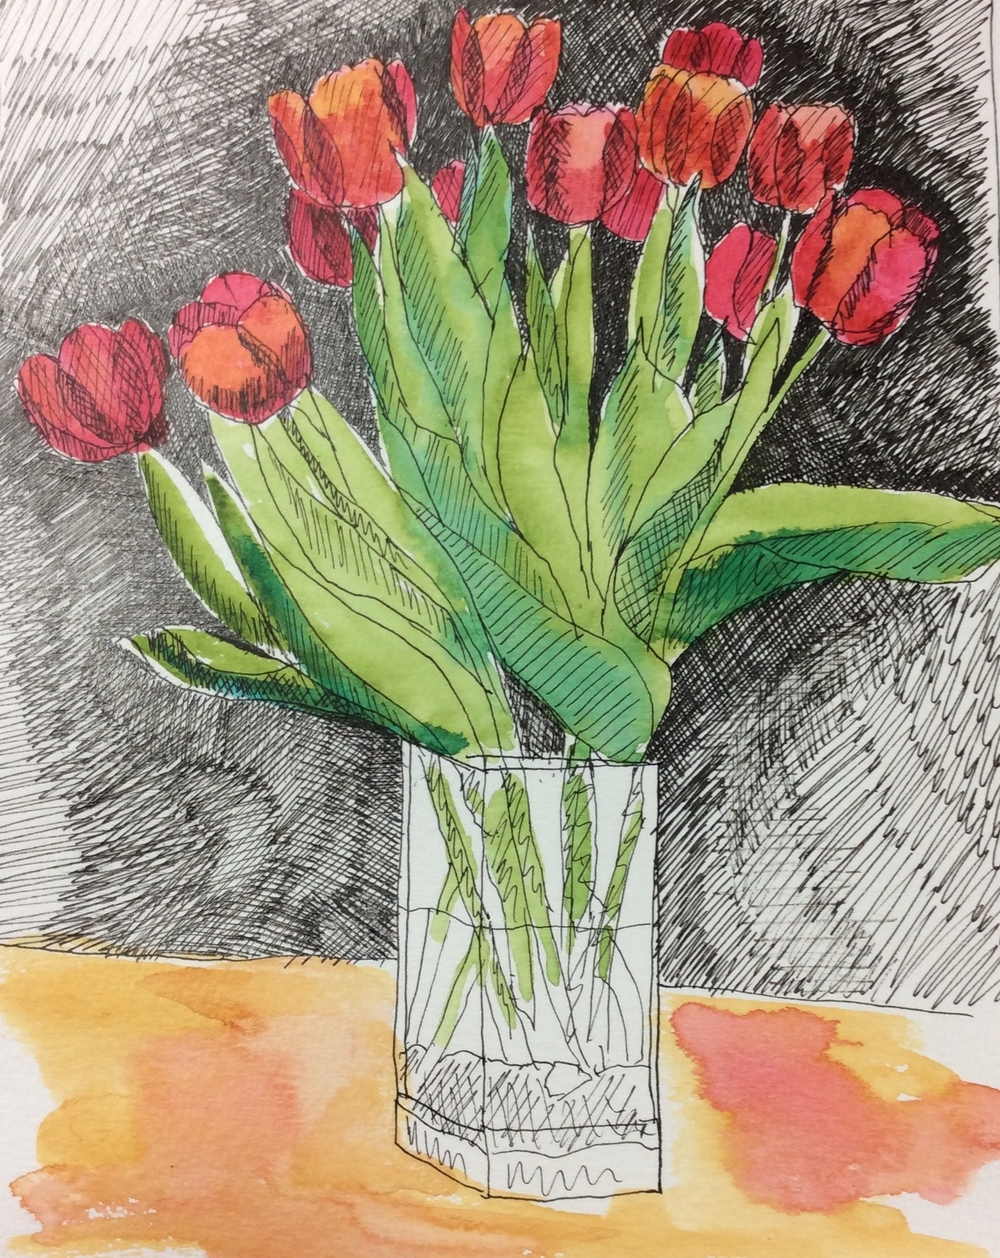 """Wanda's Tulips"" Art journal, ink and watercolour"